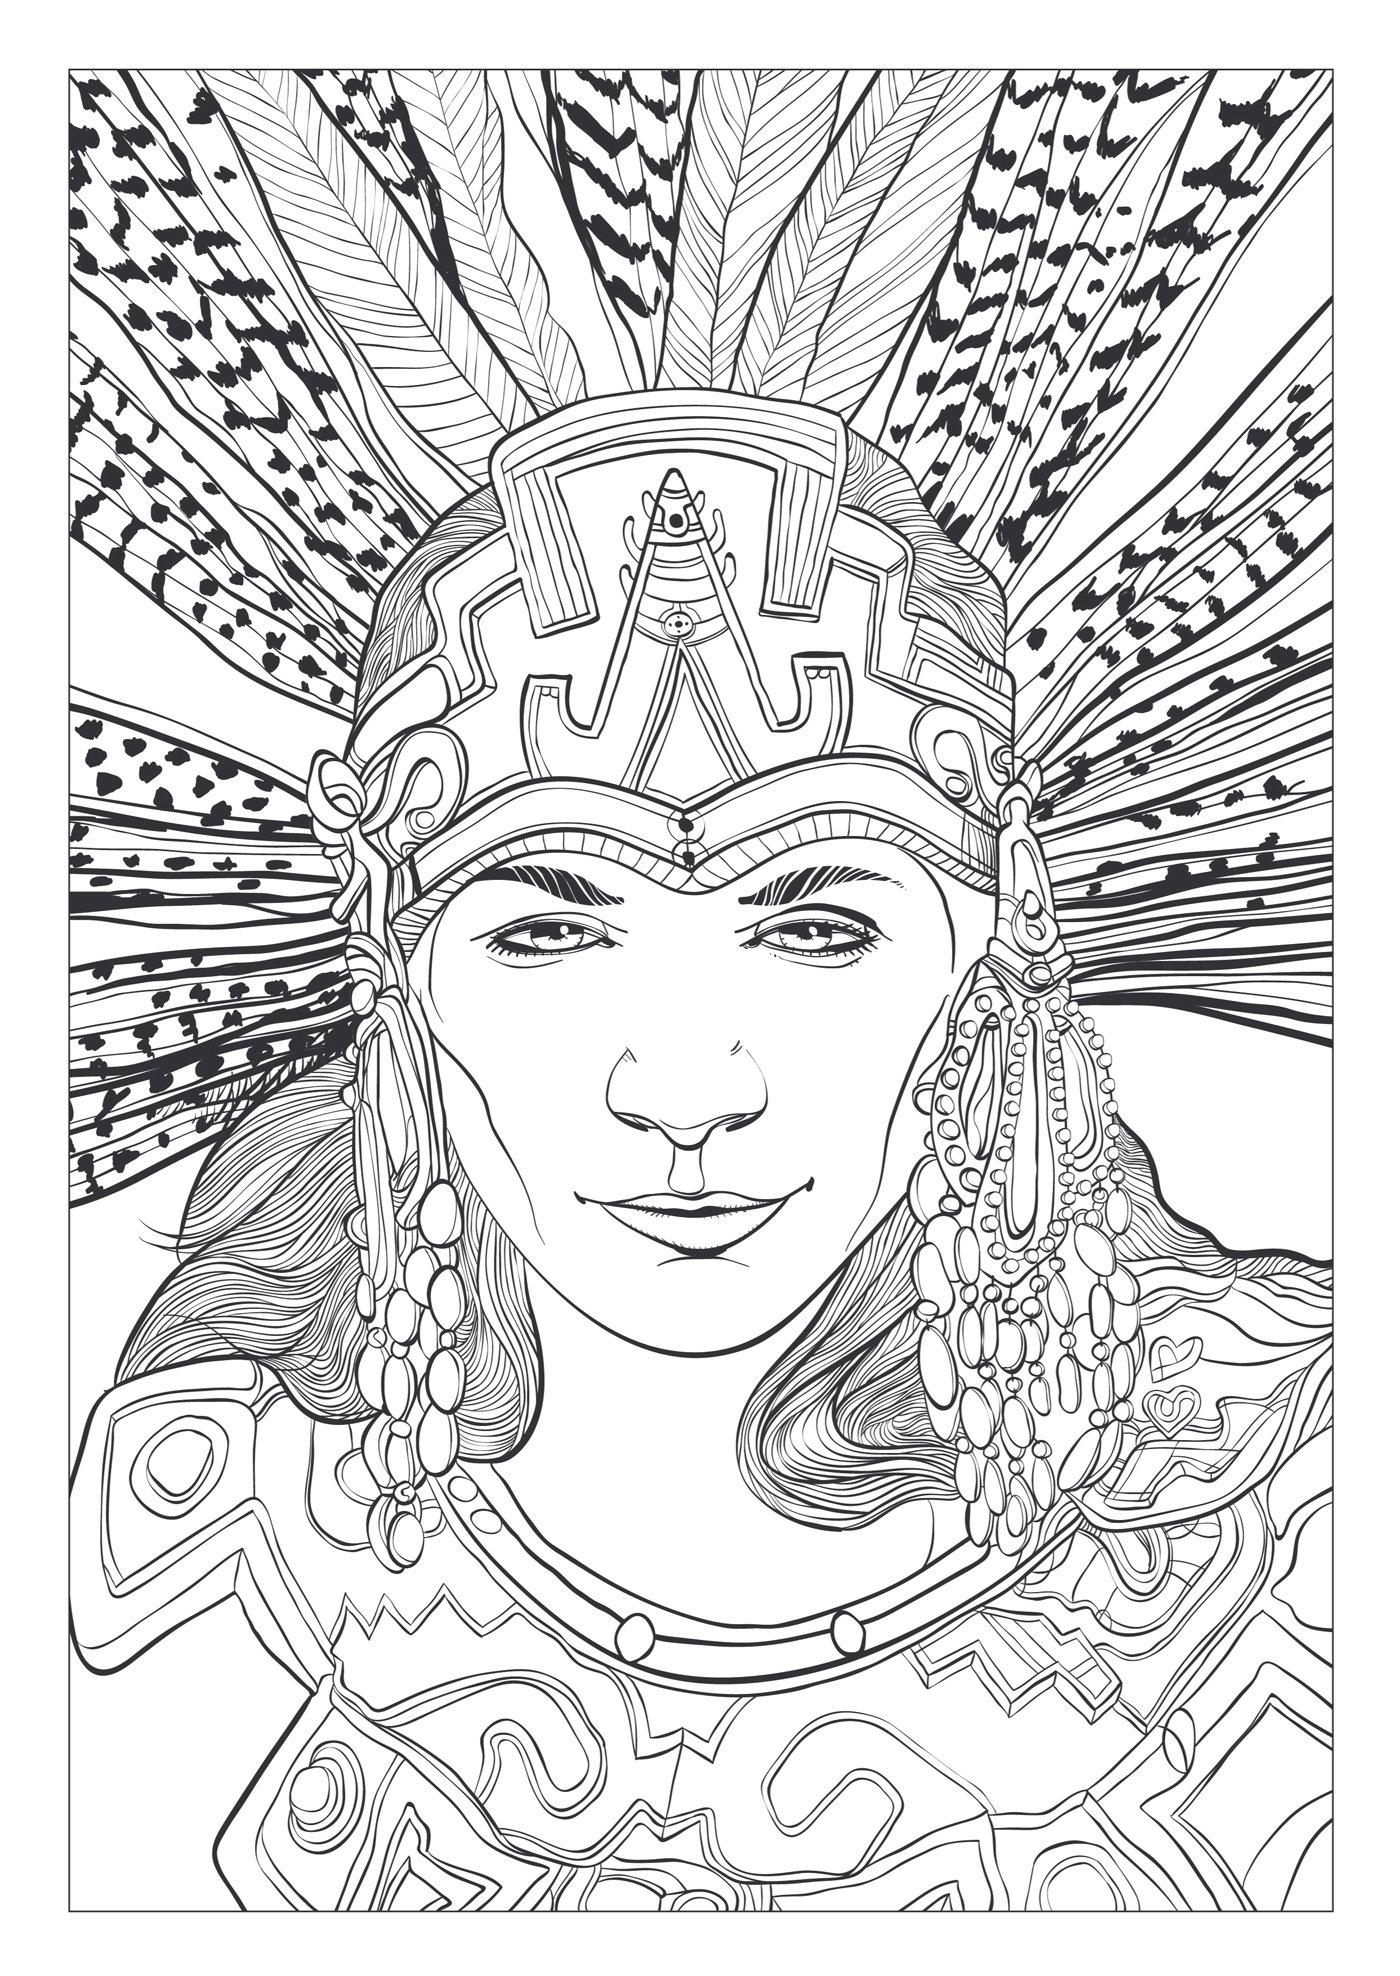 art therapie mayas et aztques 100 coloriages anti stress french edition collectif hachette 9782013968683 amazoncom books